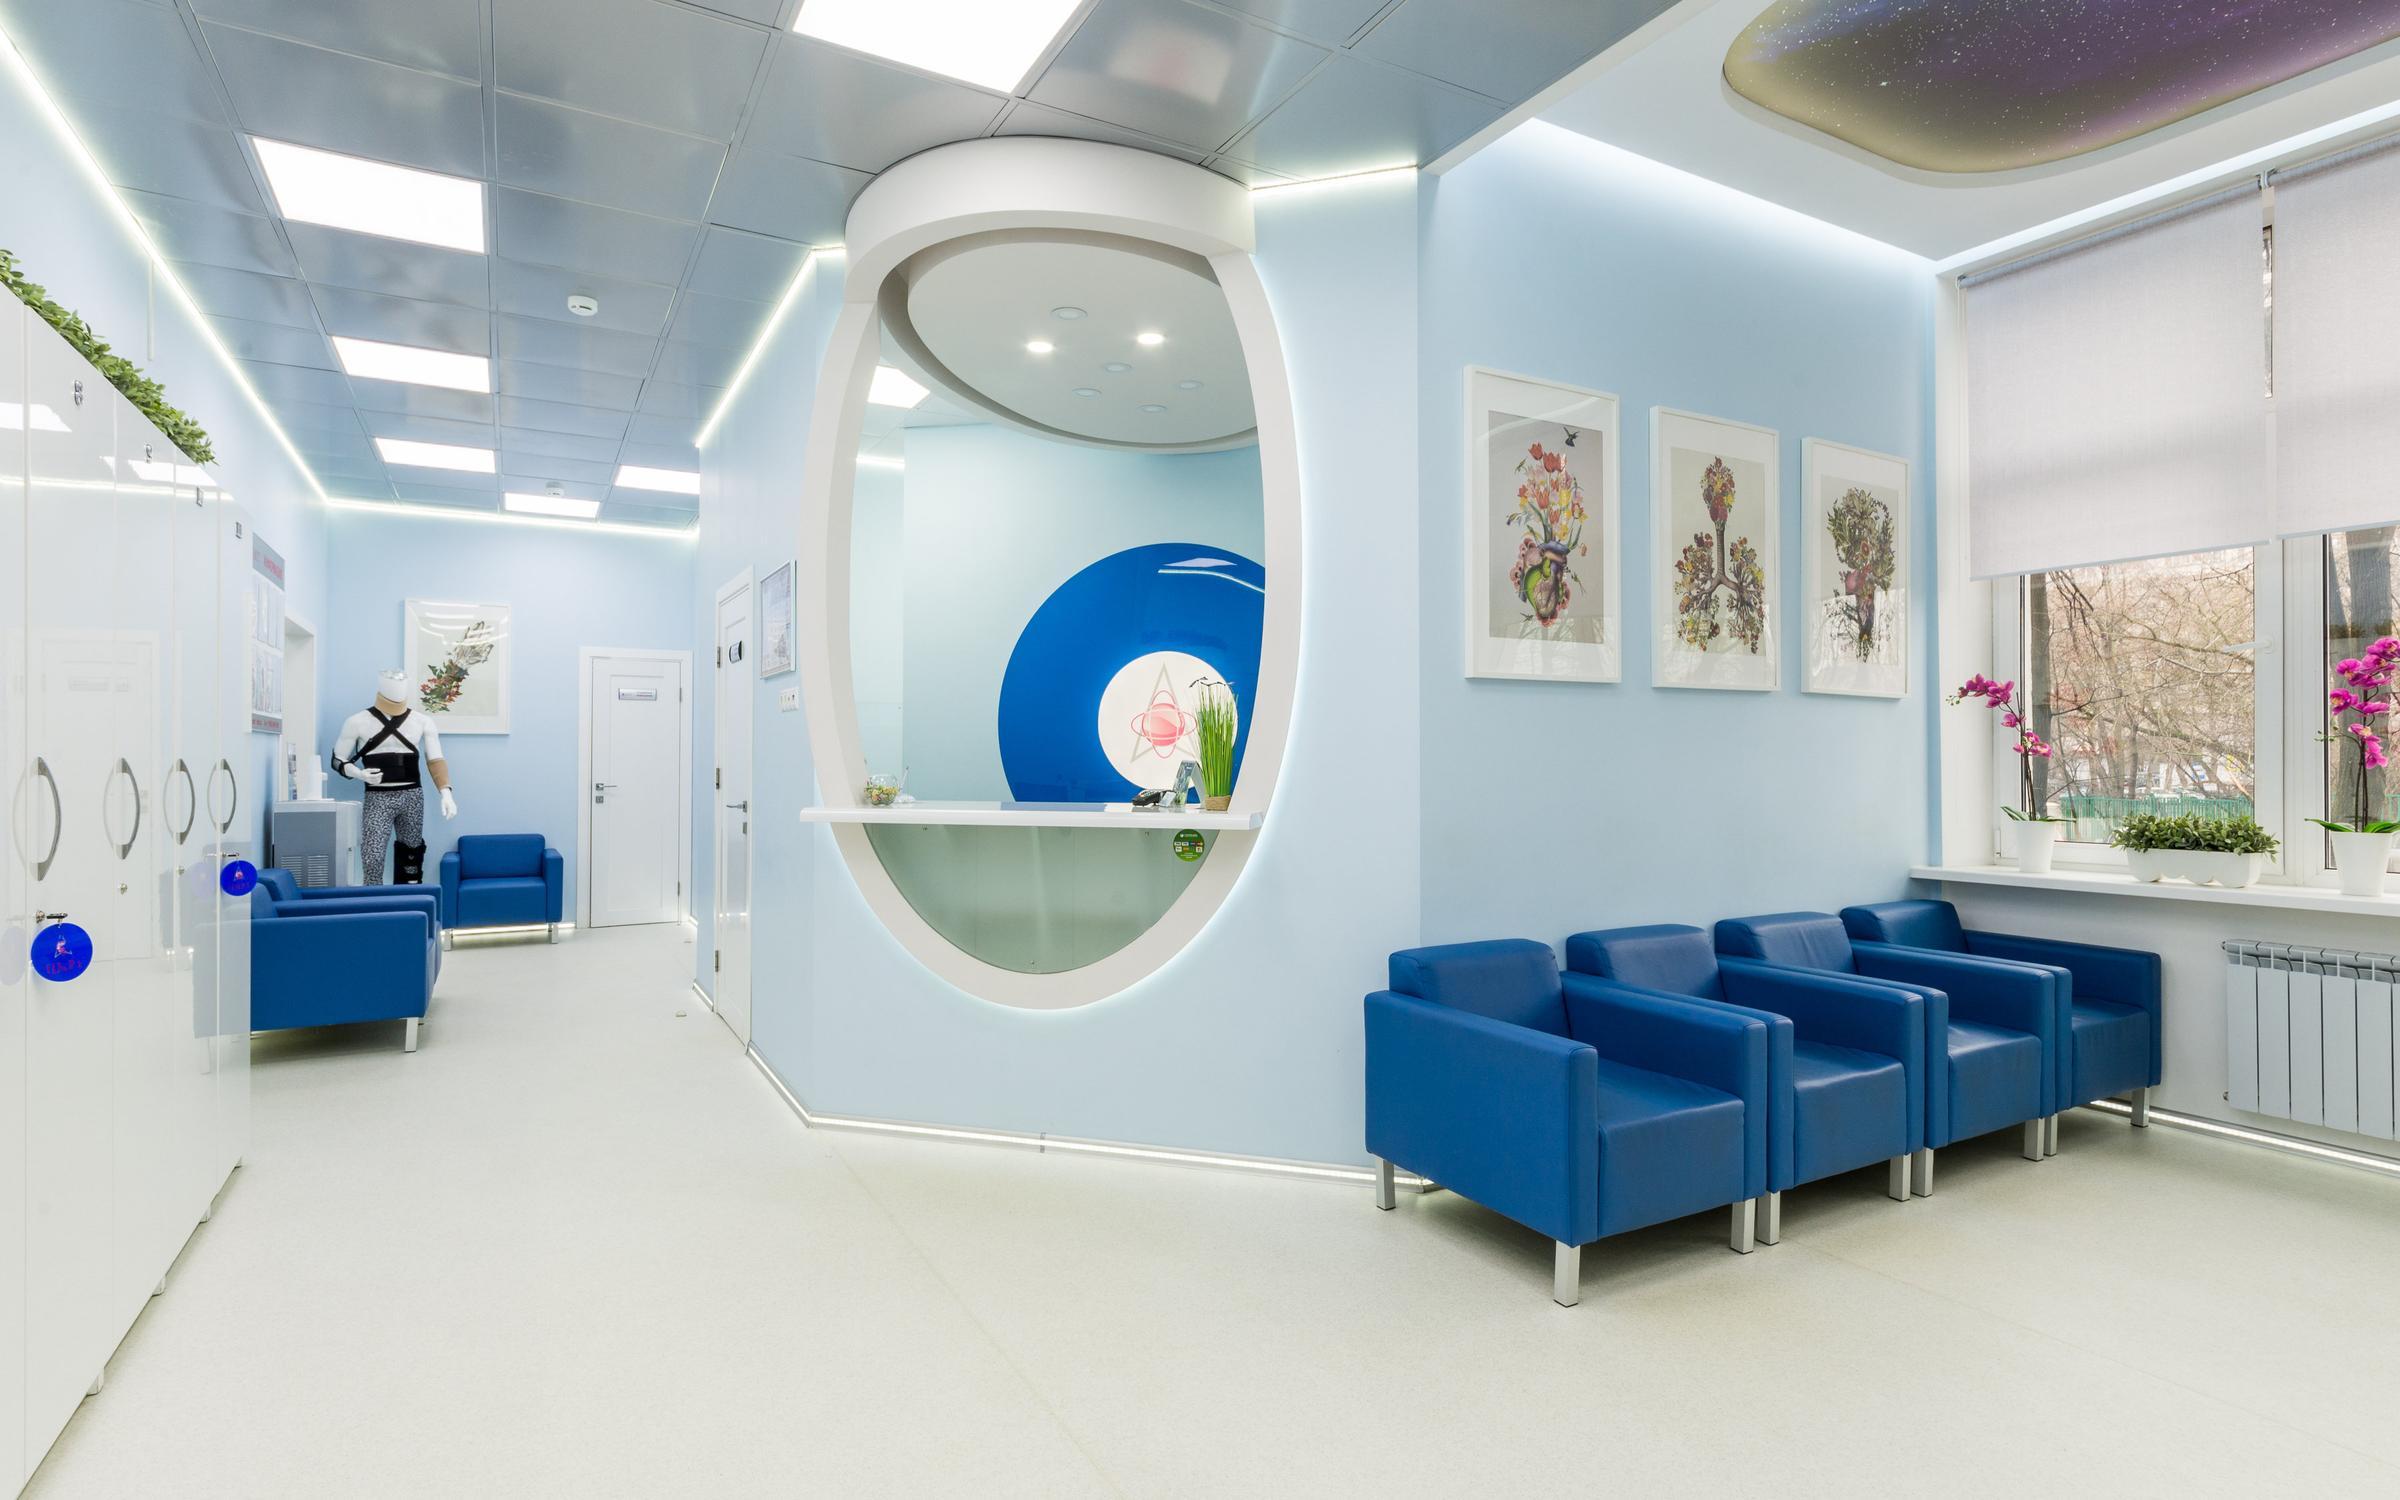 фотография Лечебно-диагностического центра ЦМРТ на метро ВДНХ